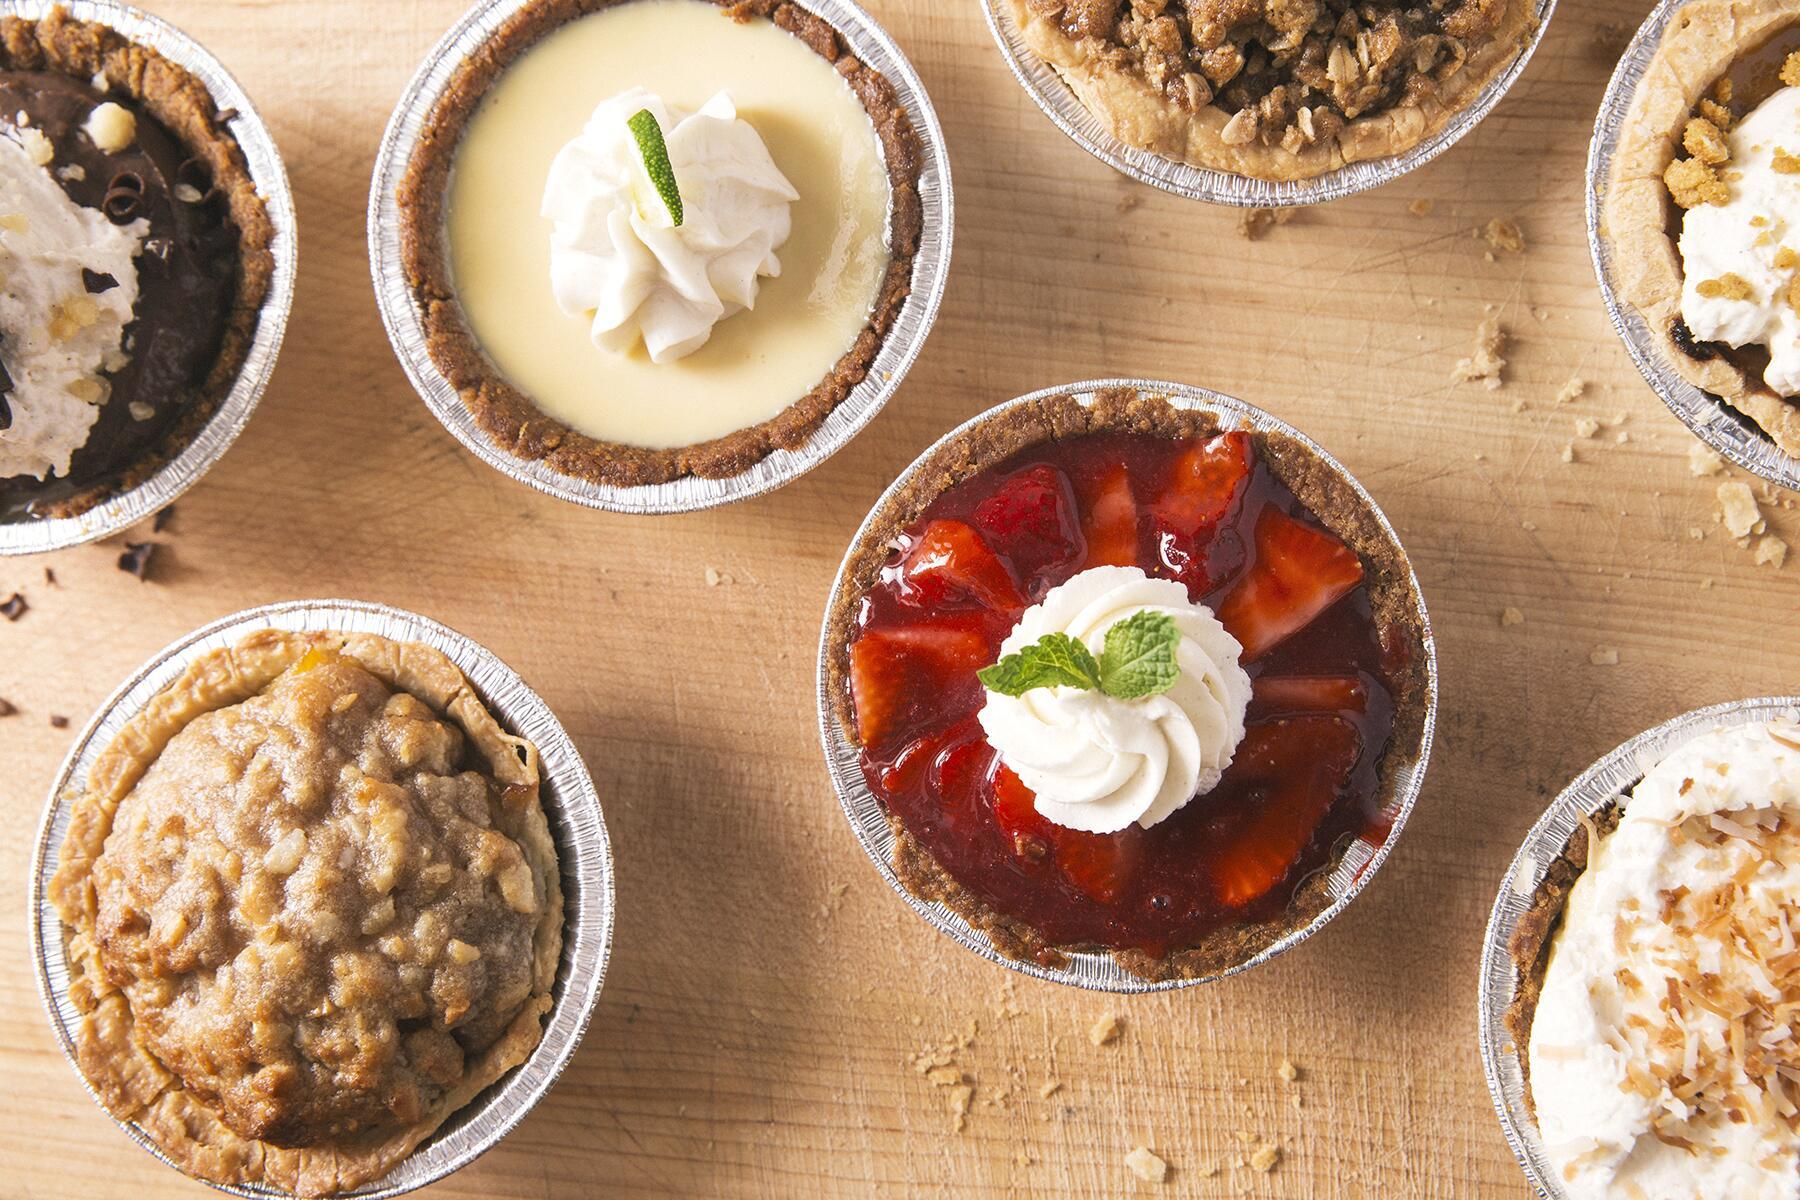 The 10 Best Pie Shops in America